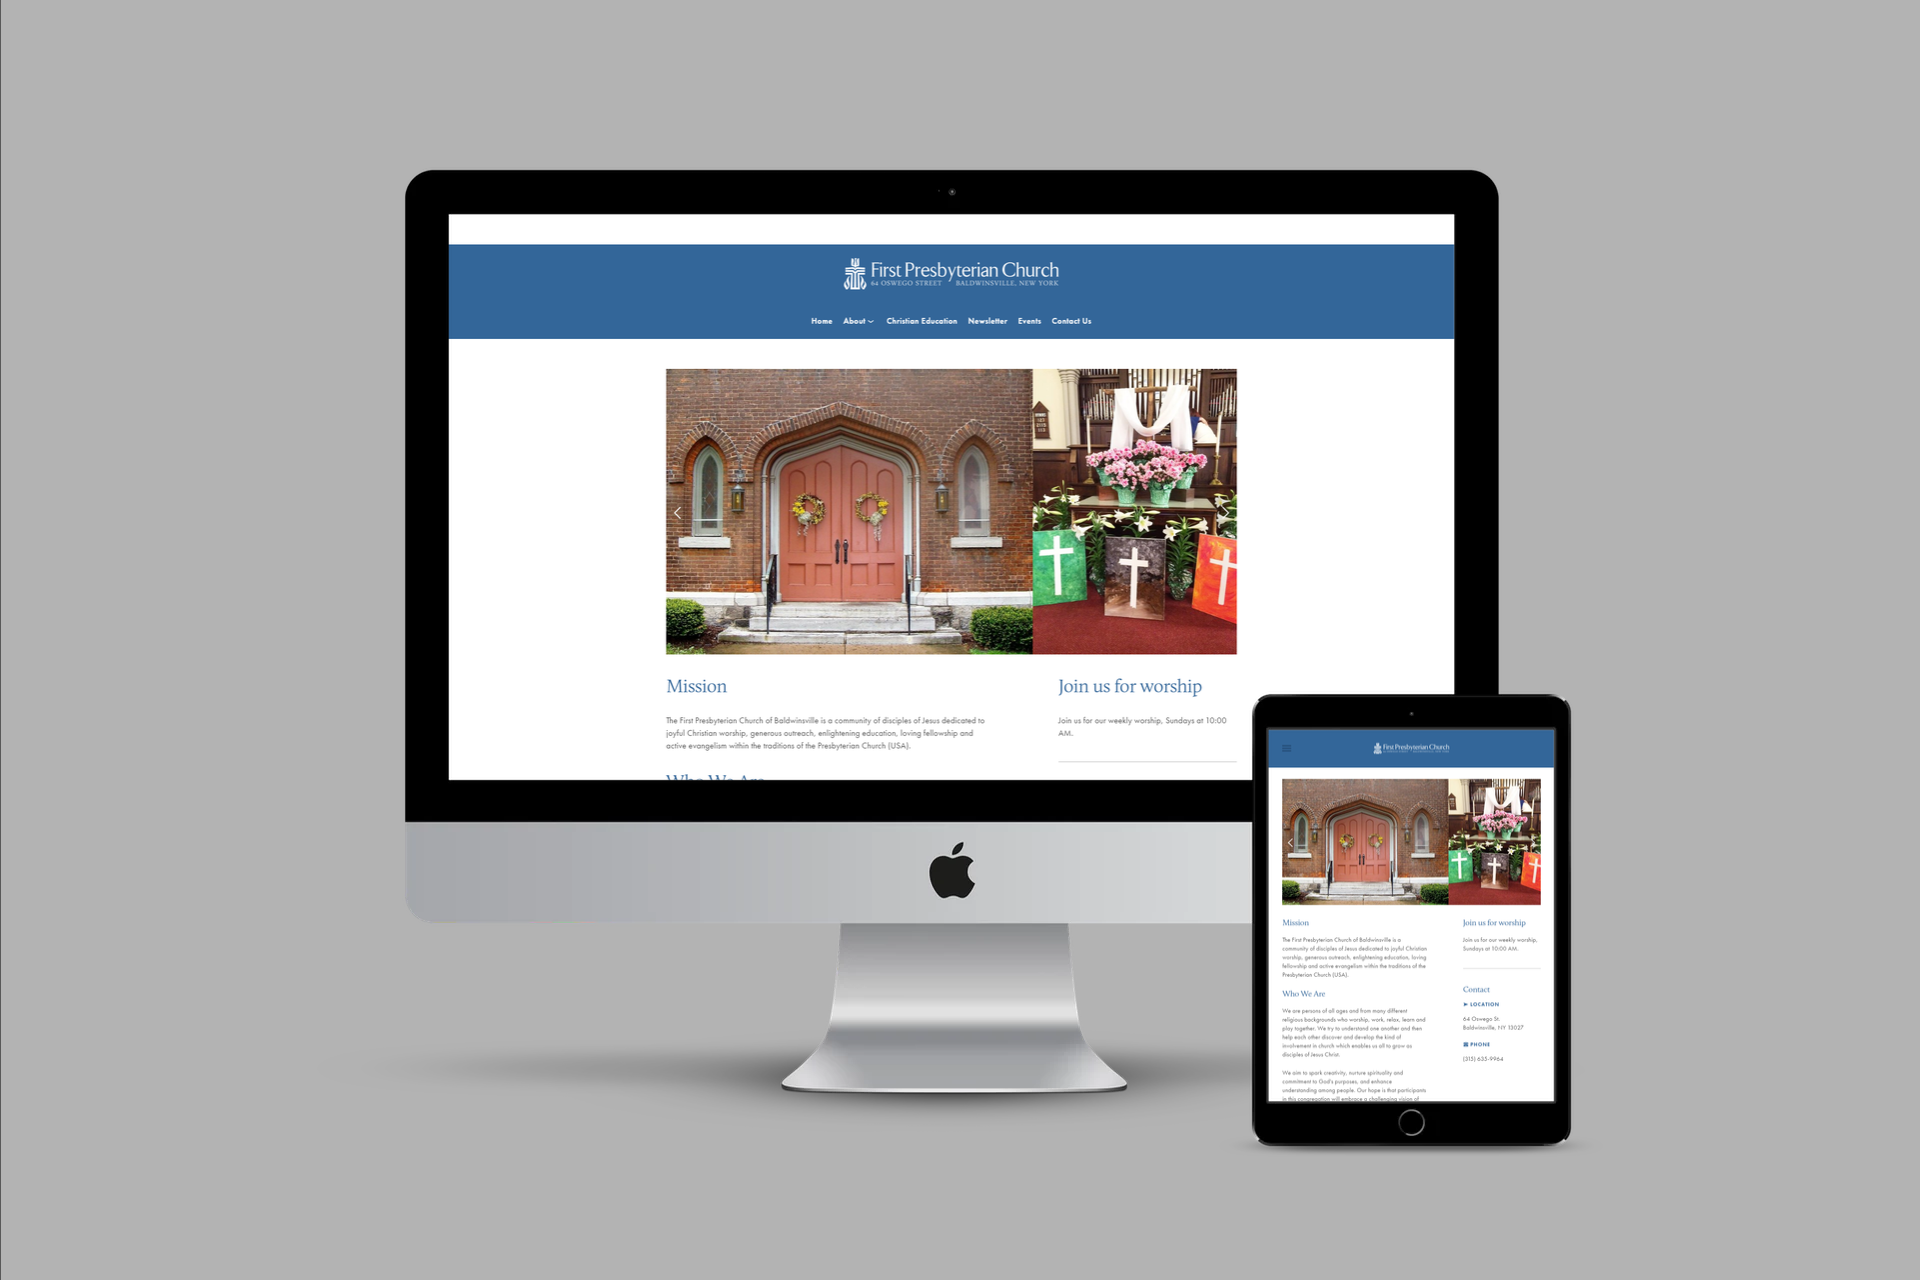 Website Design Services for Business